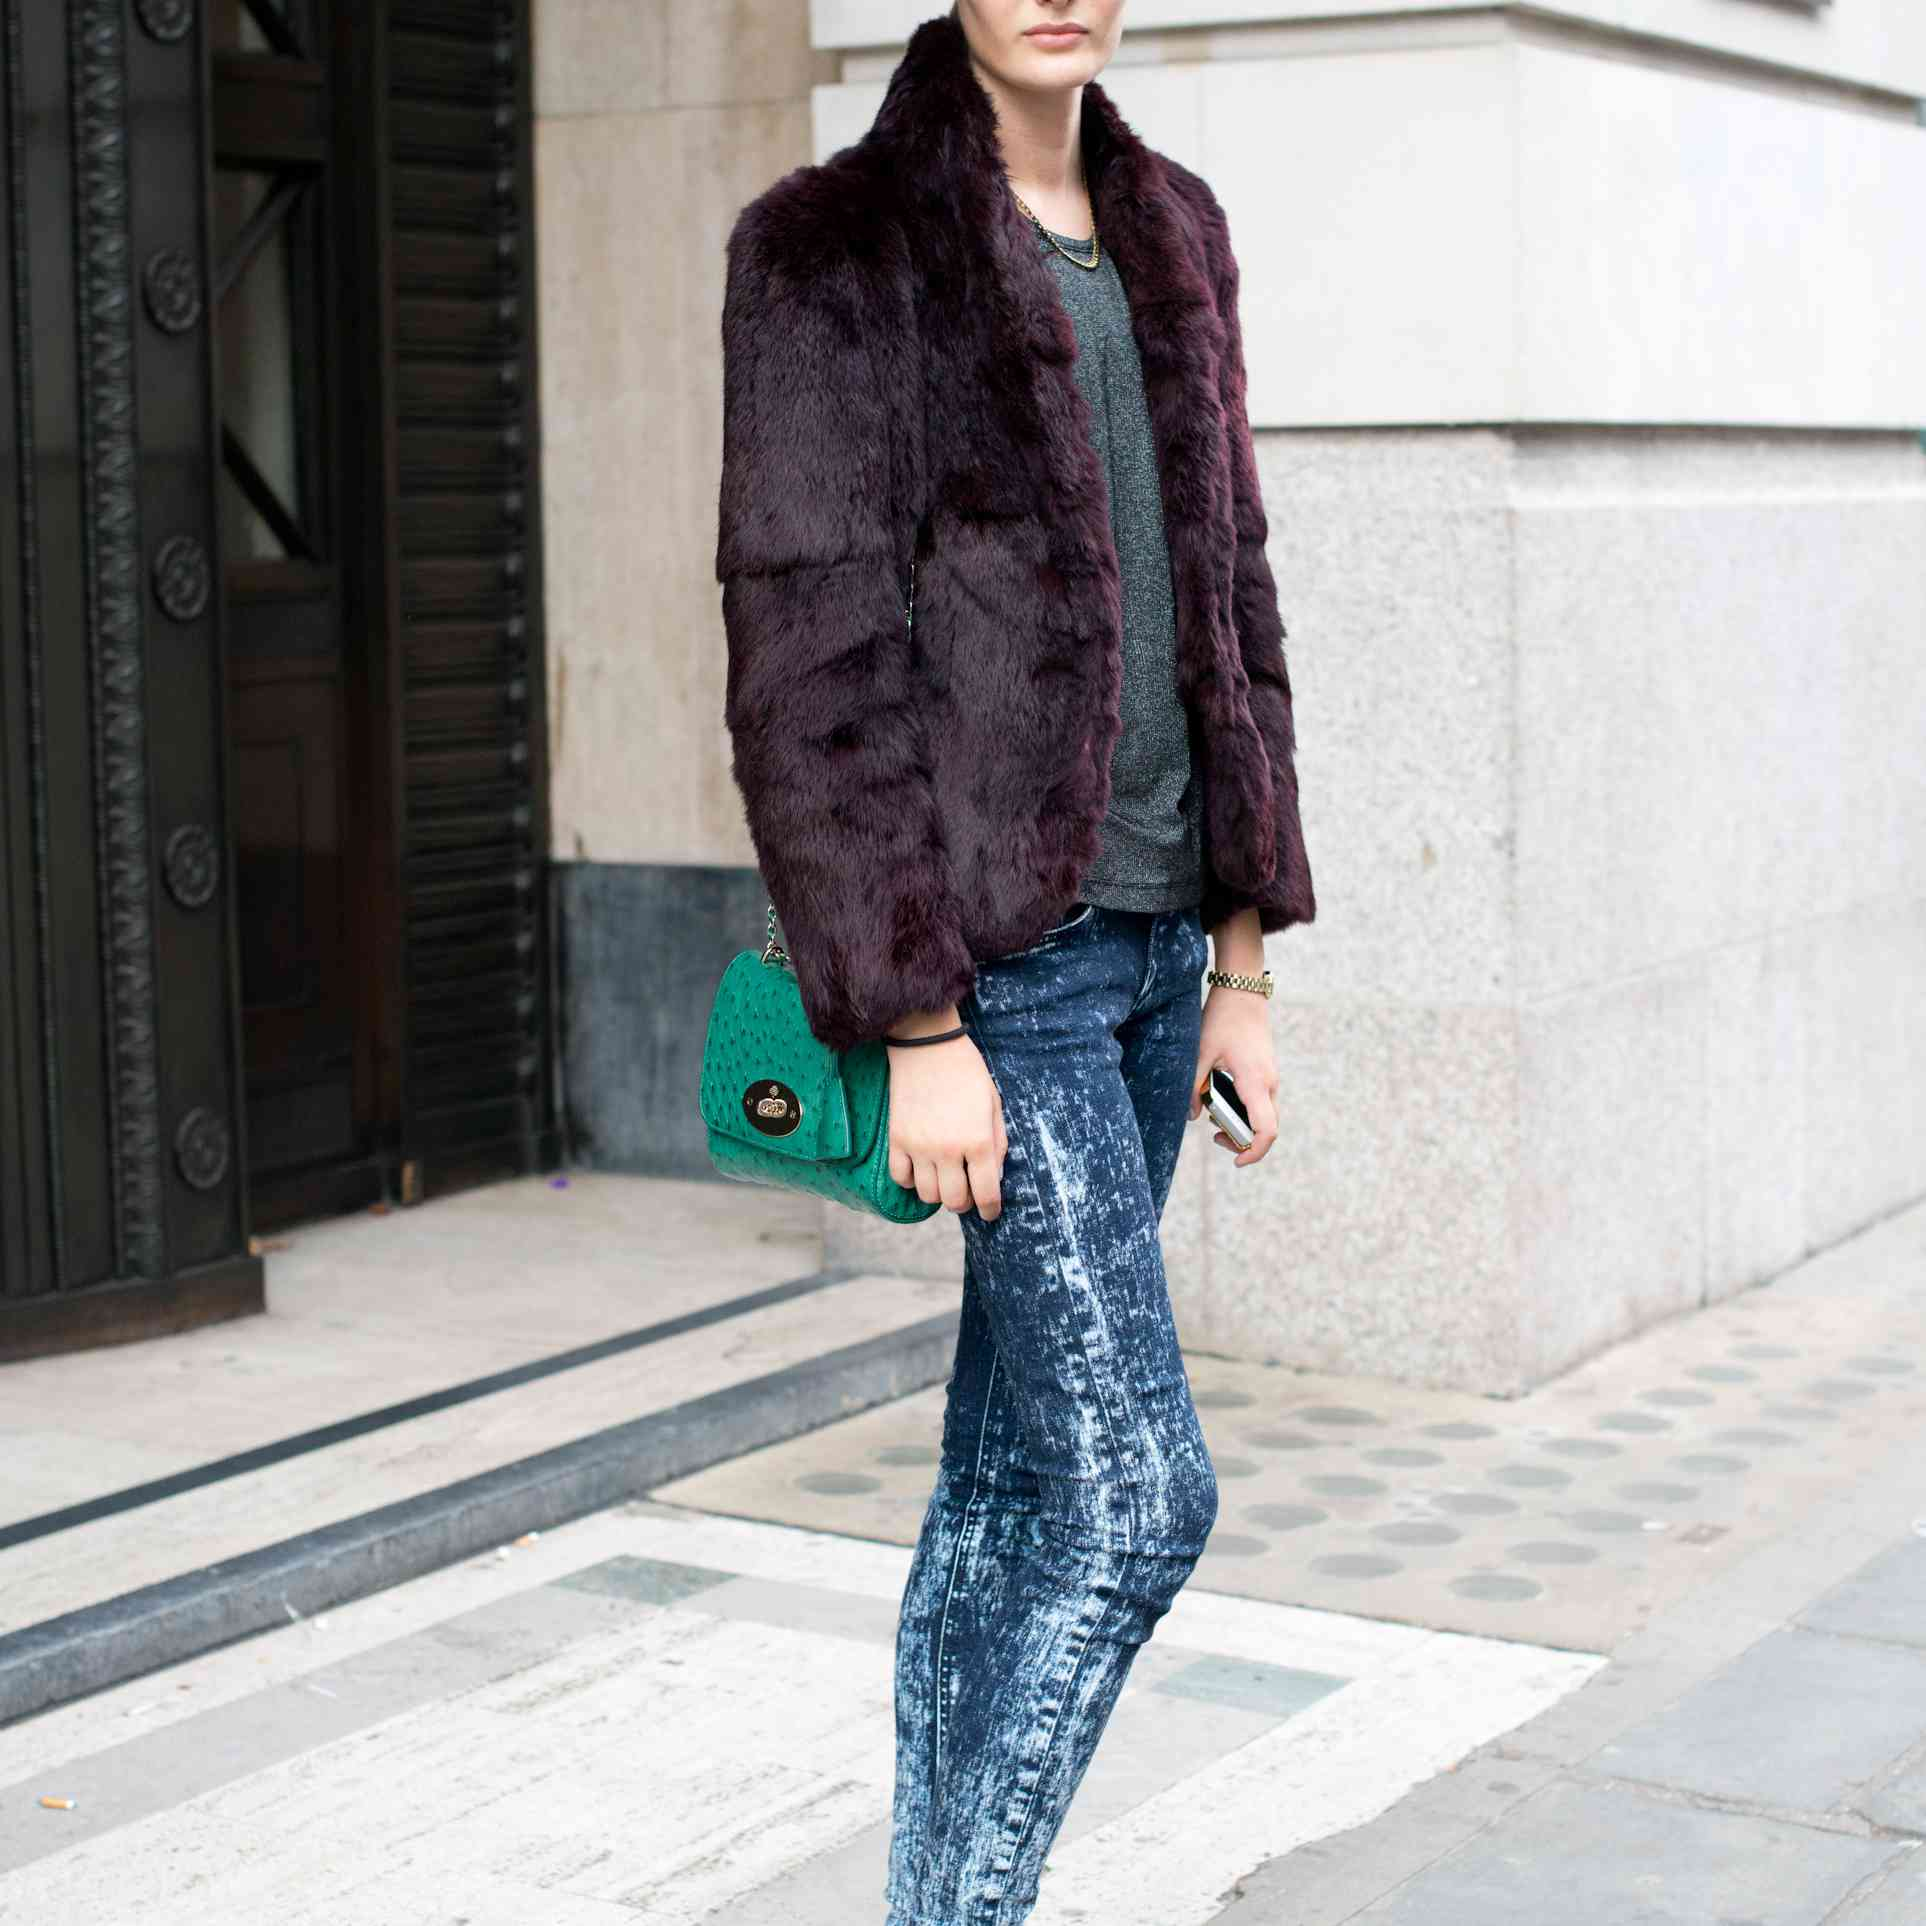 model-sam-rollinson-rag-and-bone-jeans-kirstin-sinclair.jpg